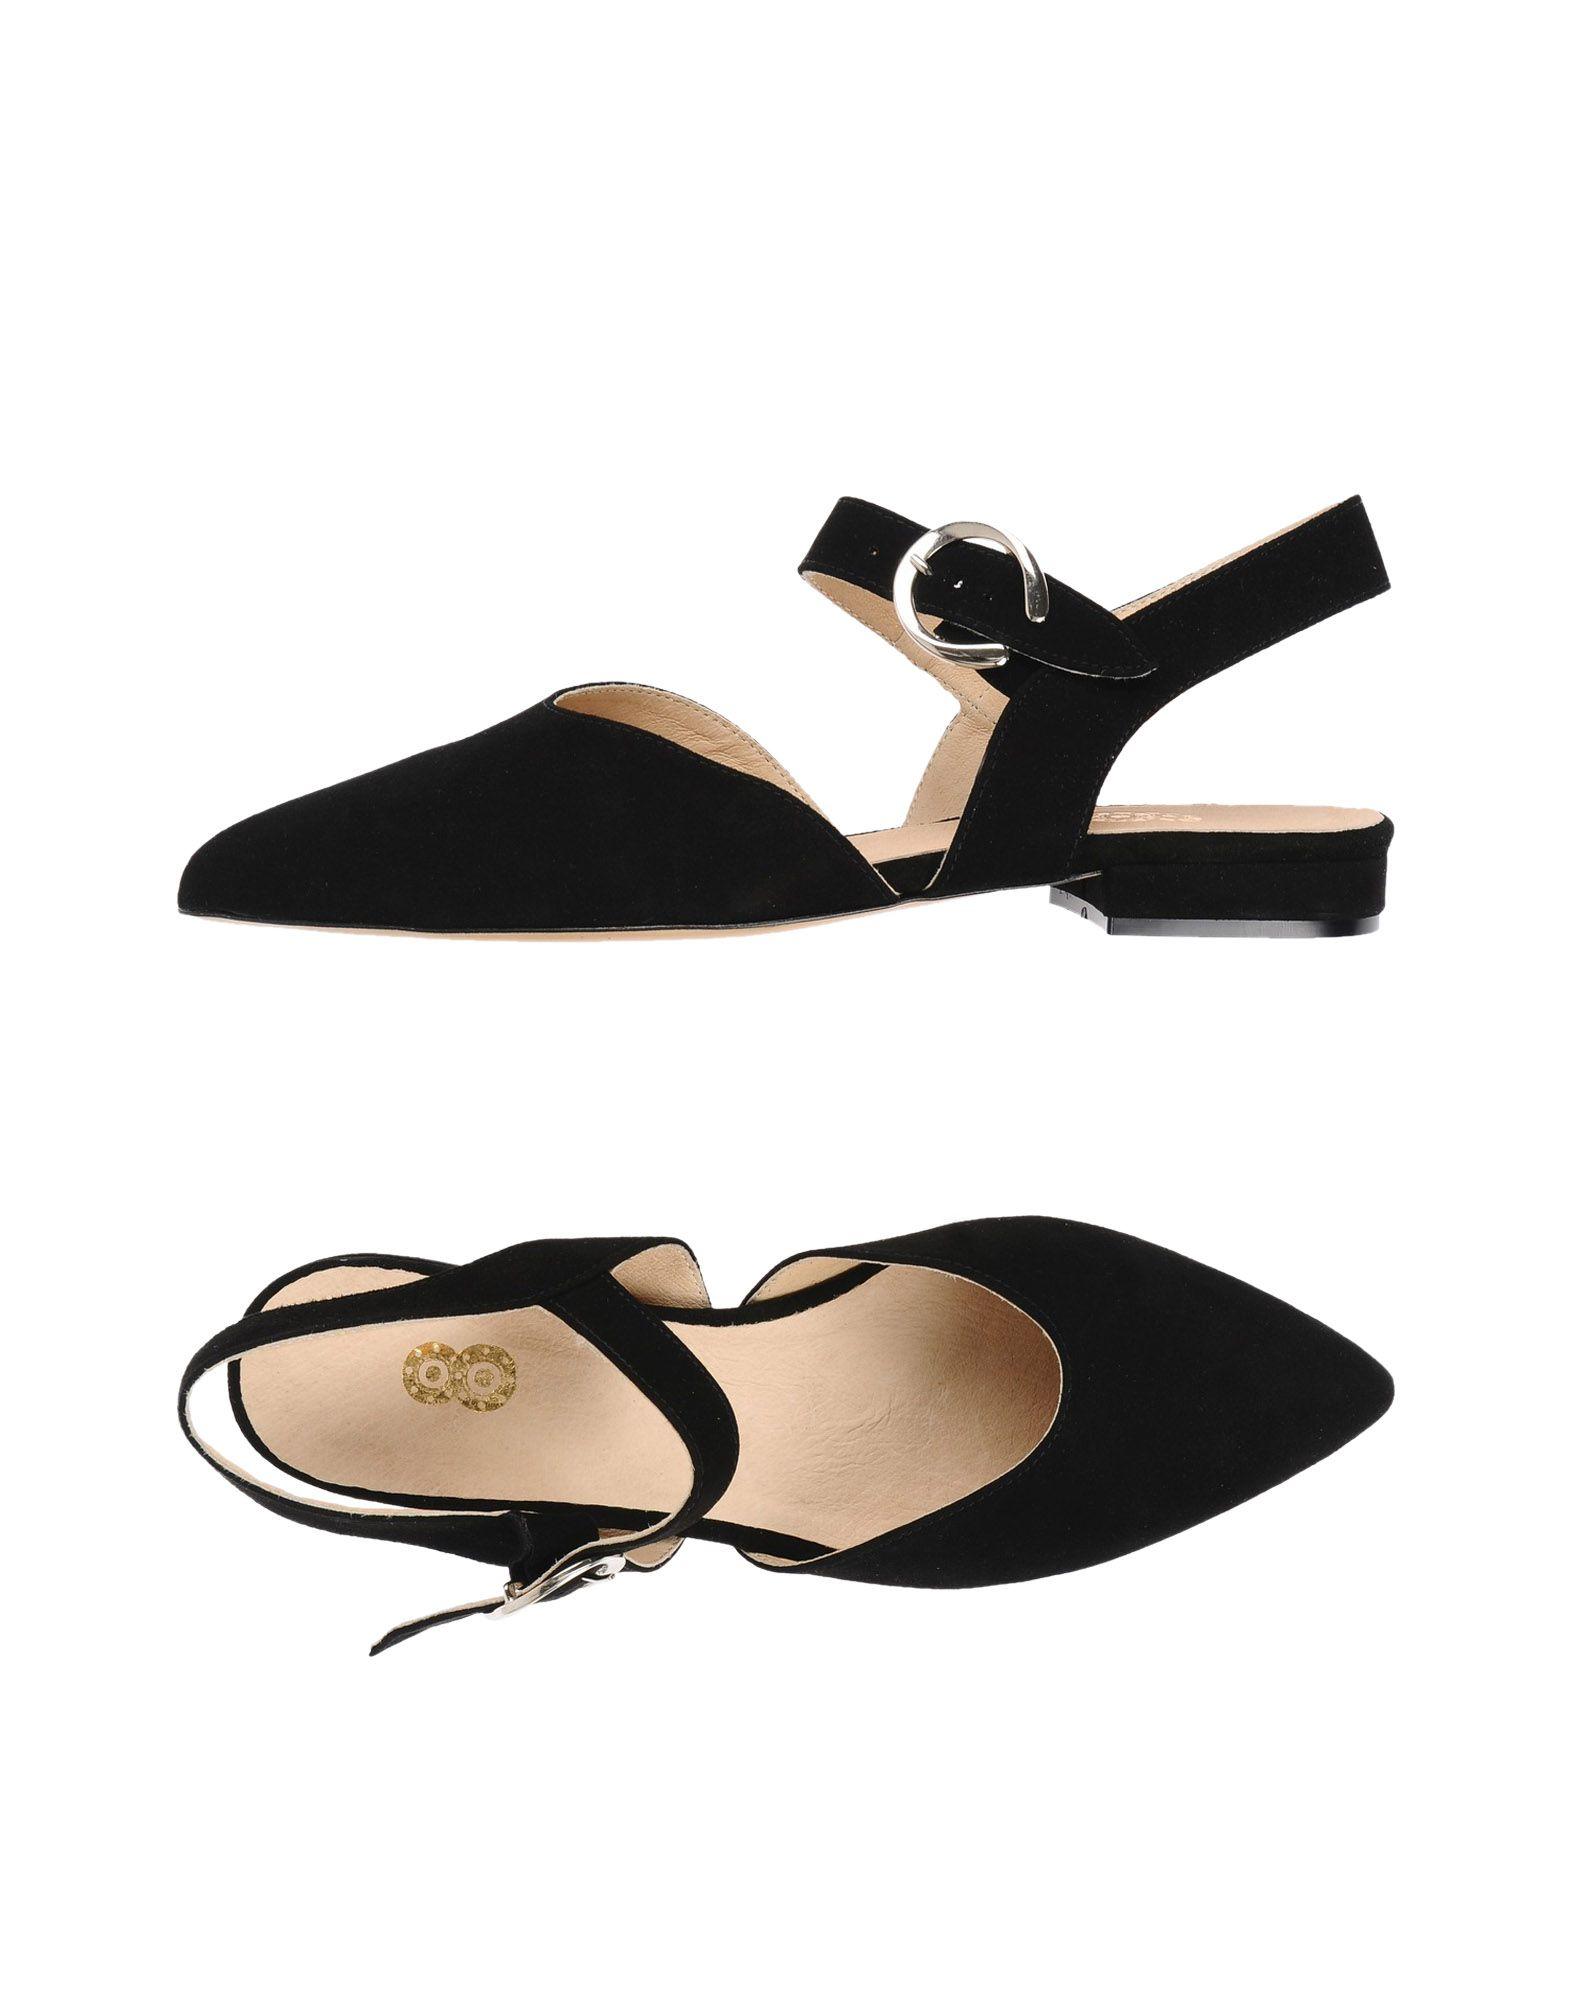 8 Ballerinas Damen  11452685VA Gute Qualität beliebte Schuhe